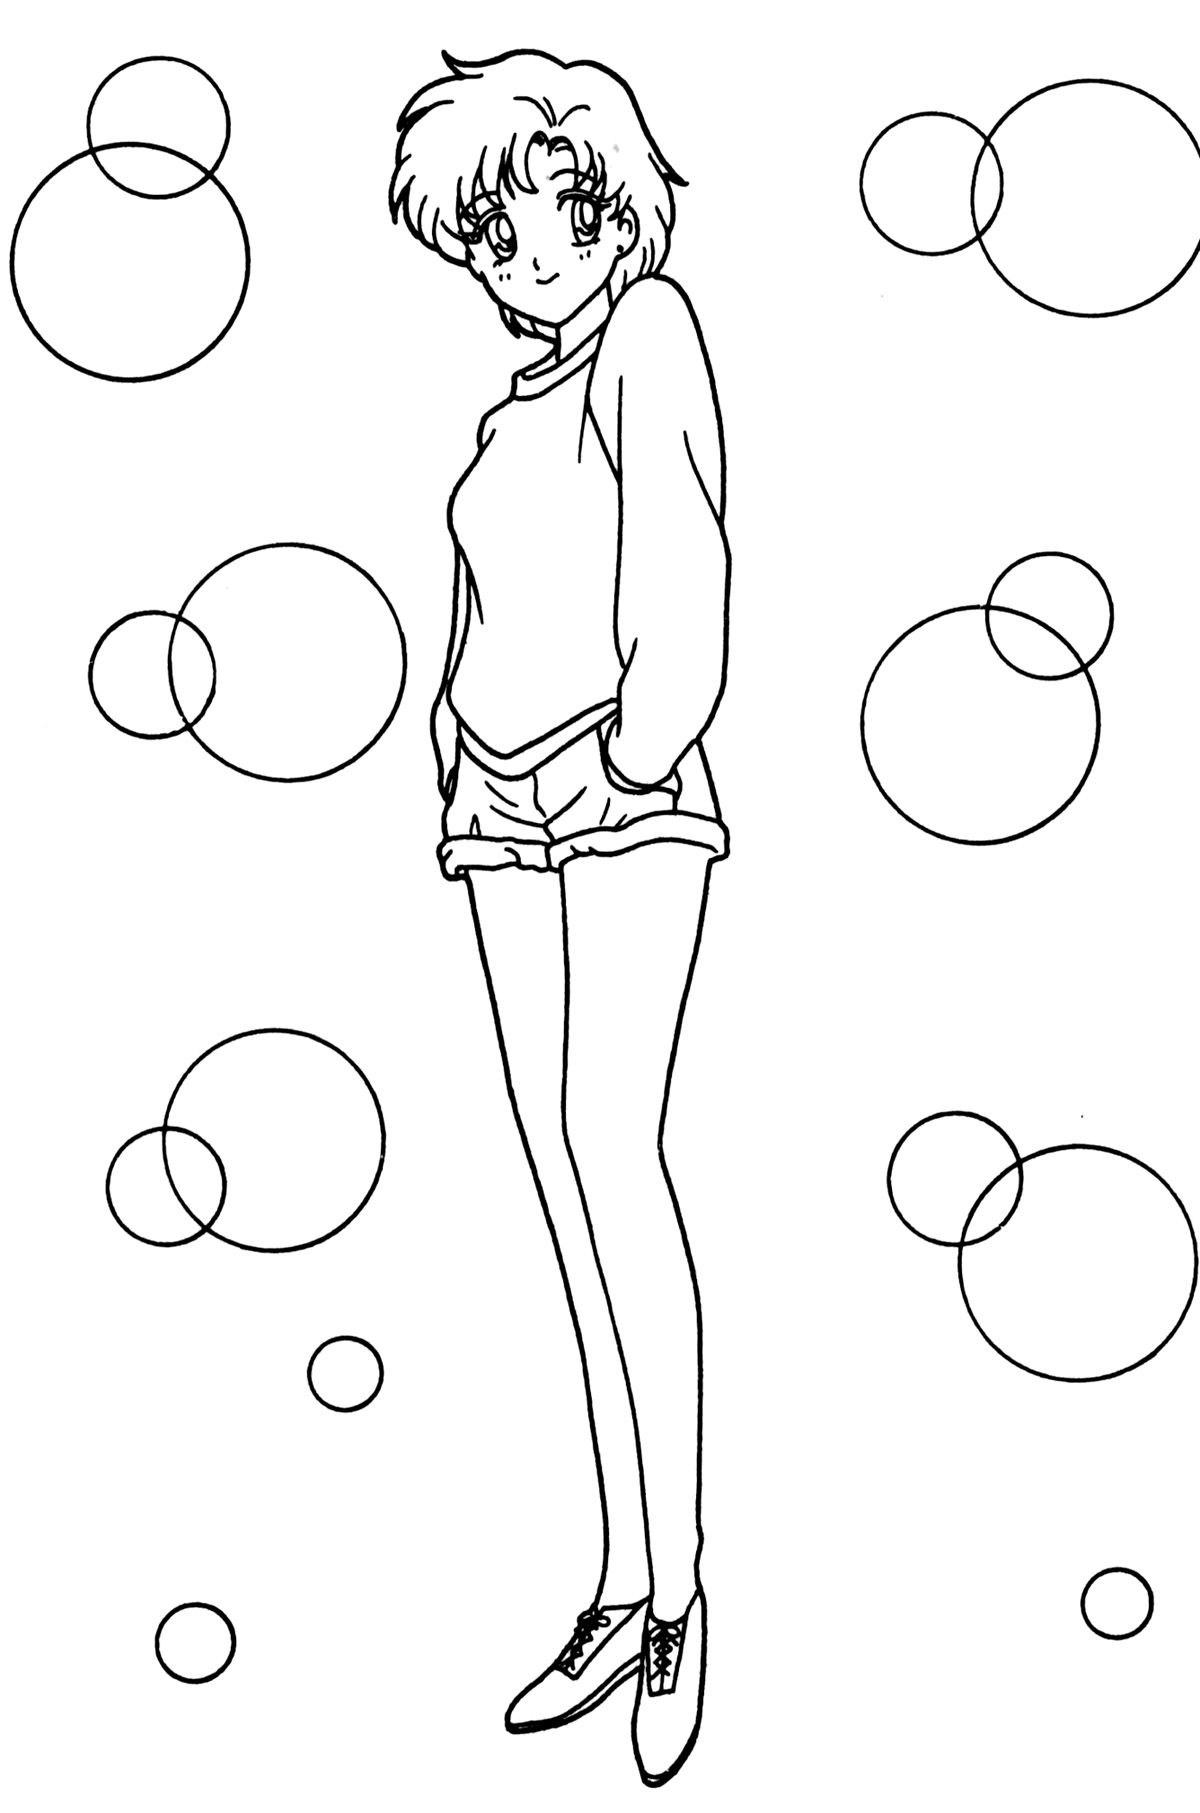 Pin de Patricia Iannone en Manga - Sailor Moon | Pinterest